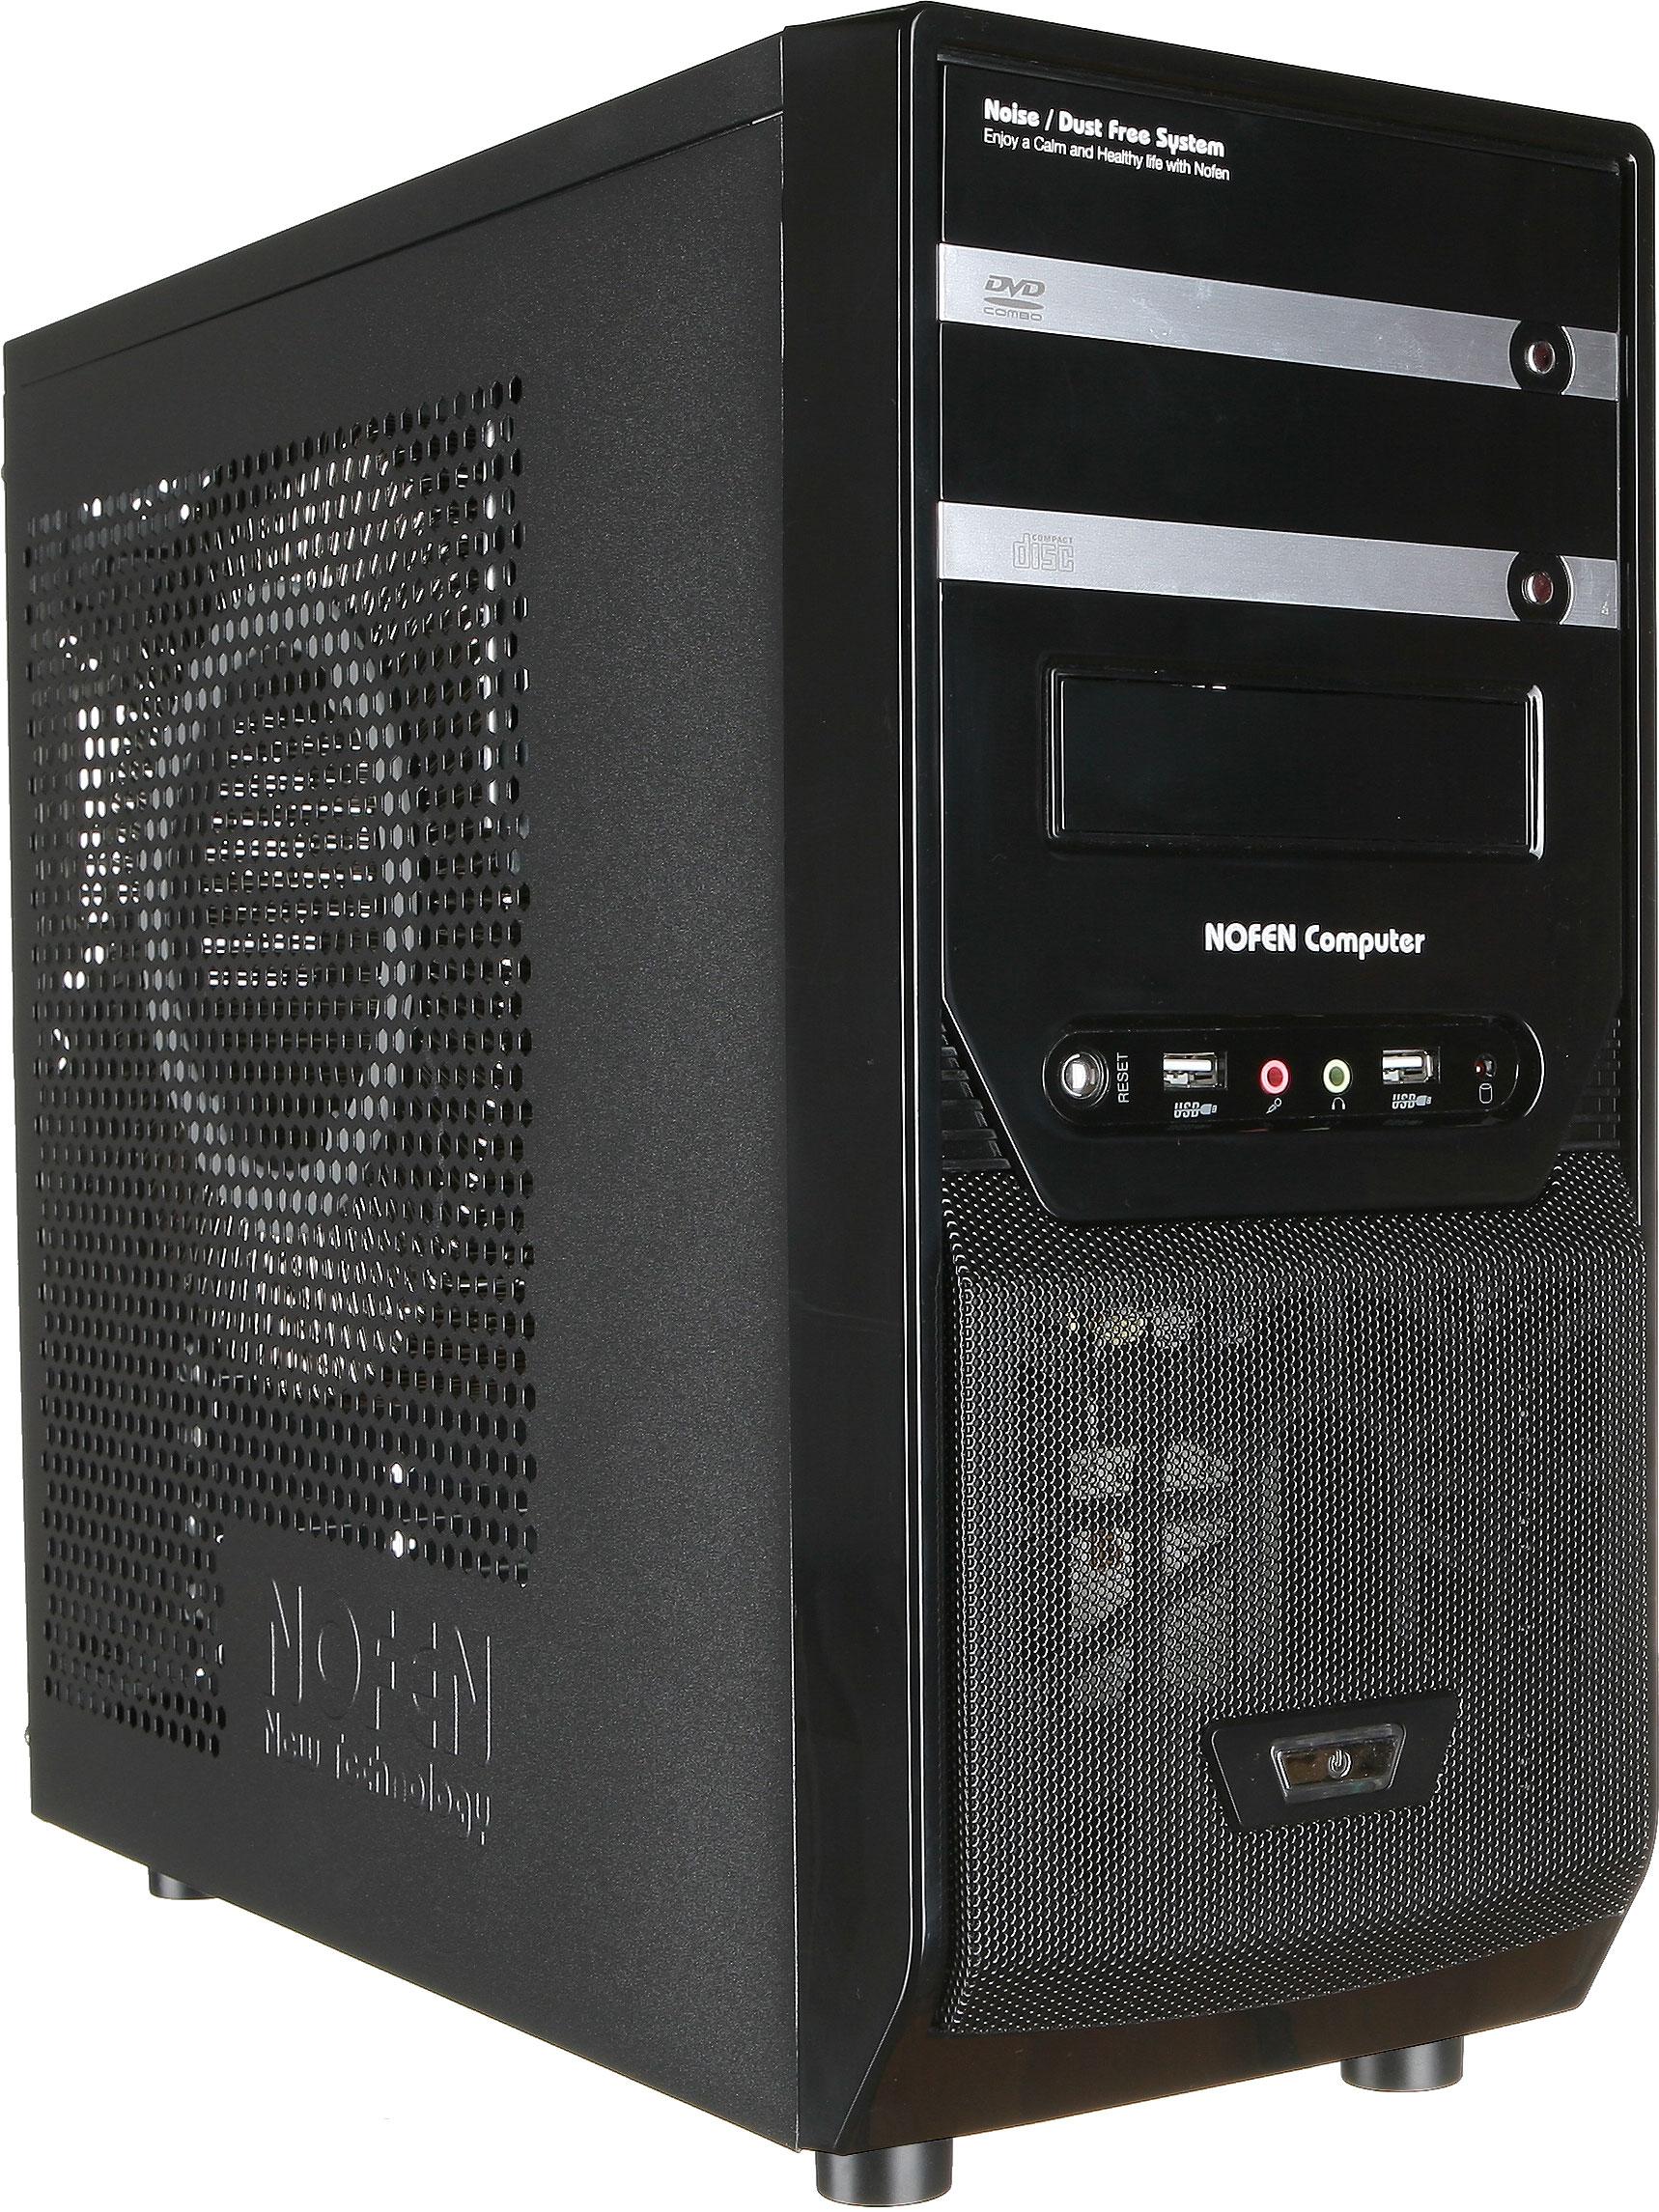 SET-A40 Fanless Bundle: CS-30 Case, 400W PSU and CPU Cooler